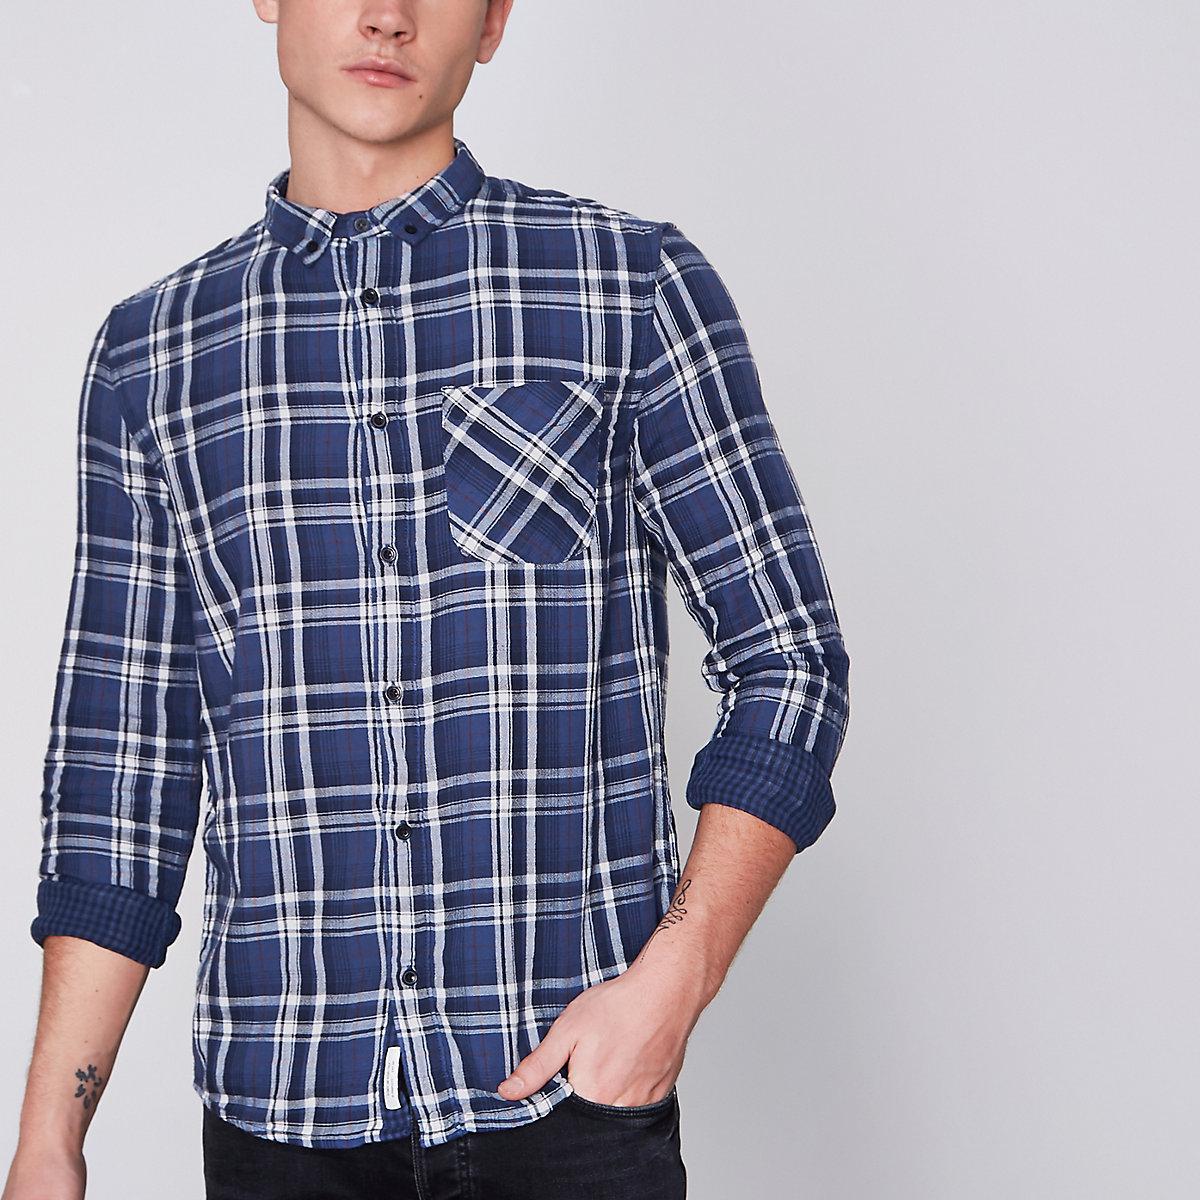 Navy check long sleeve button-down shirt